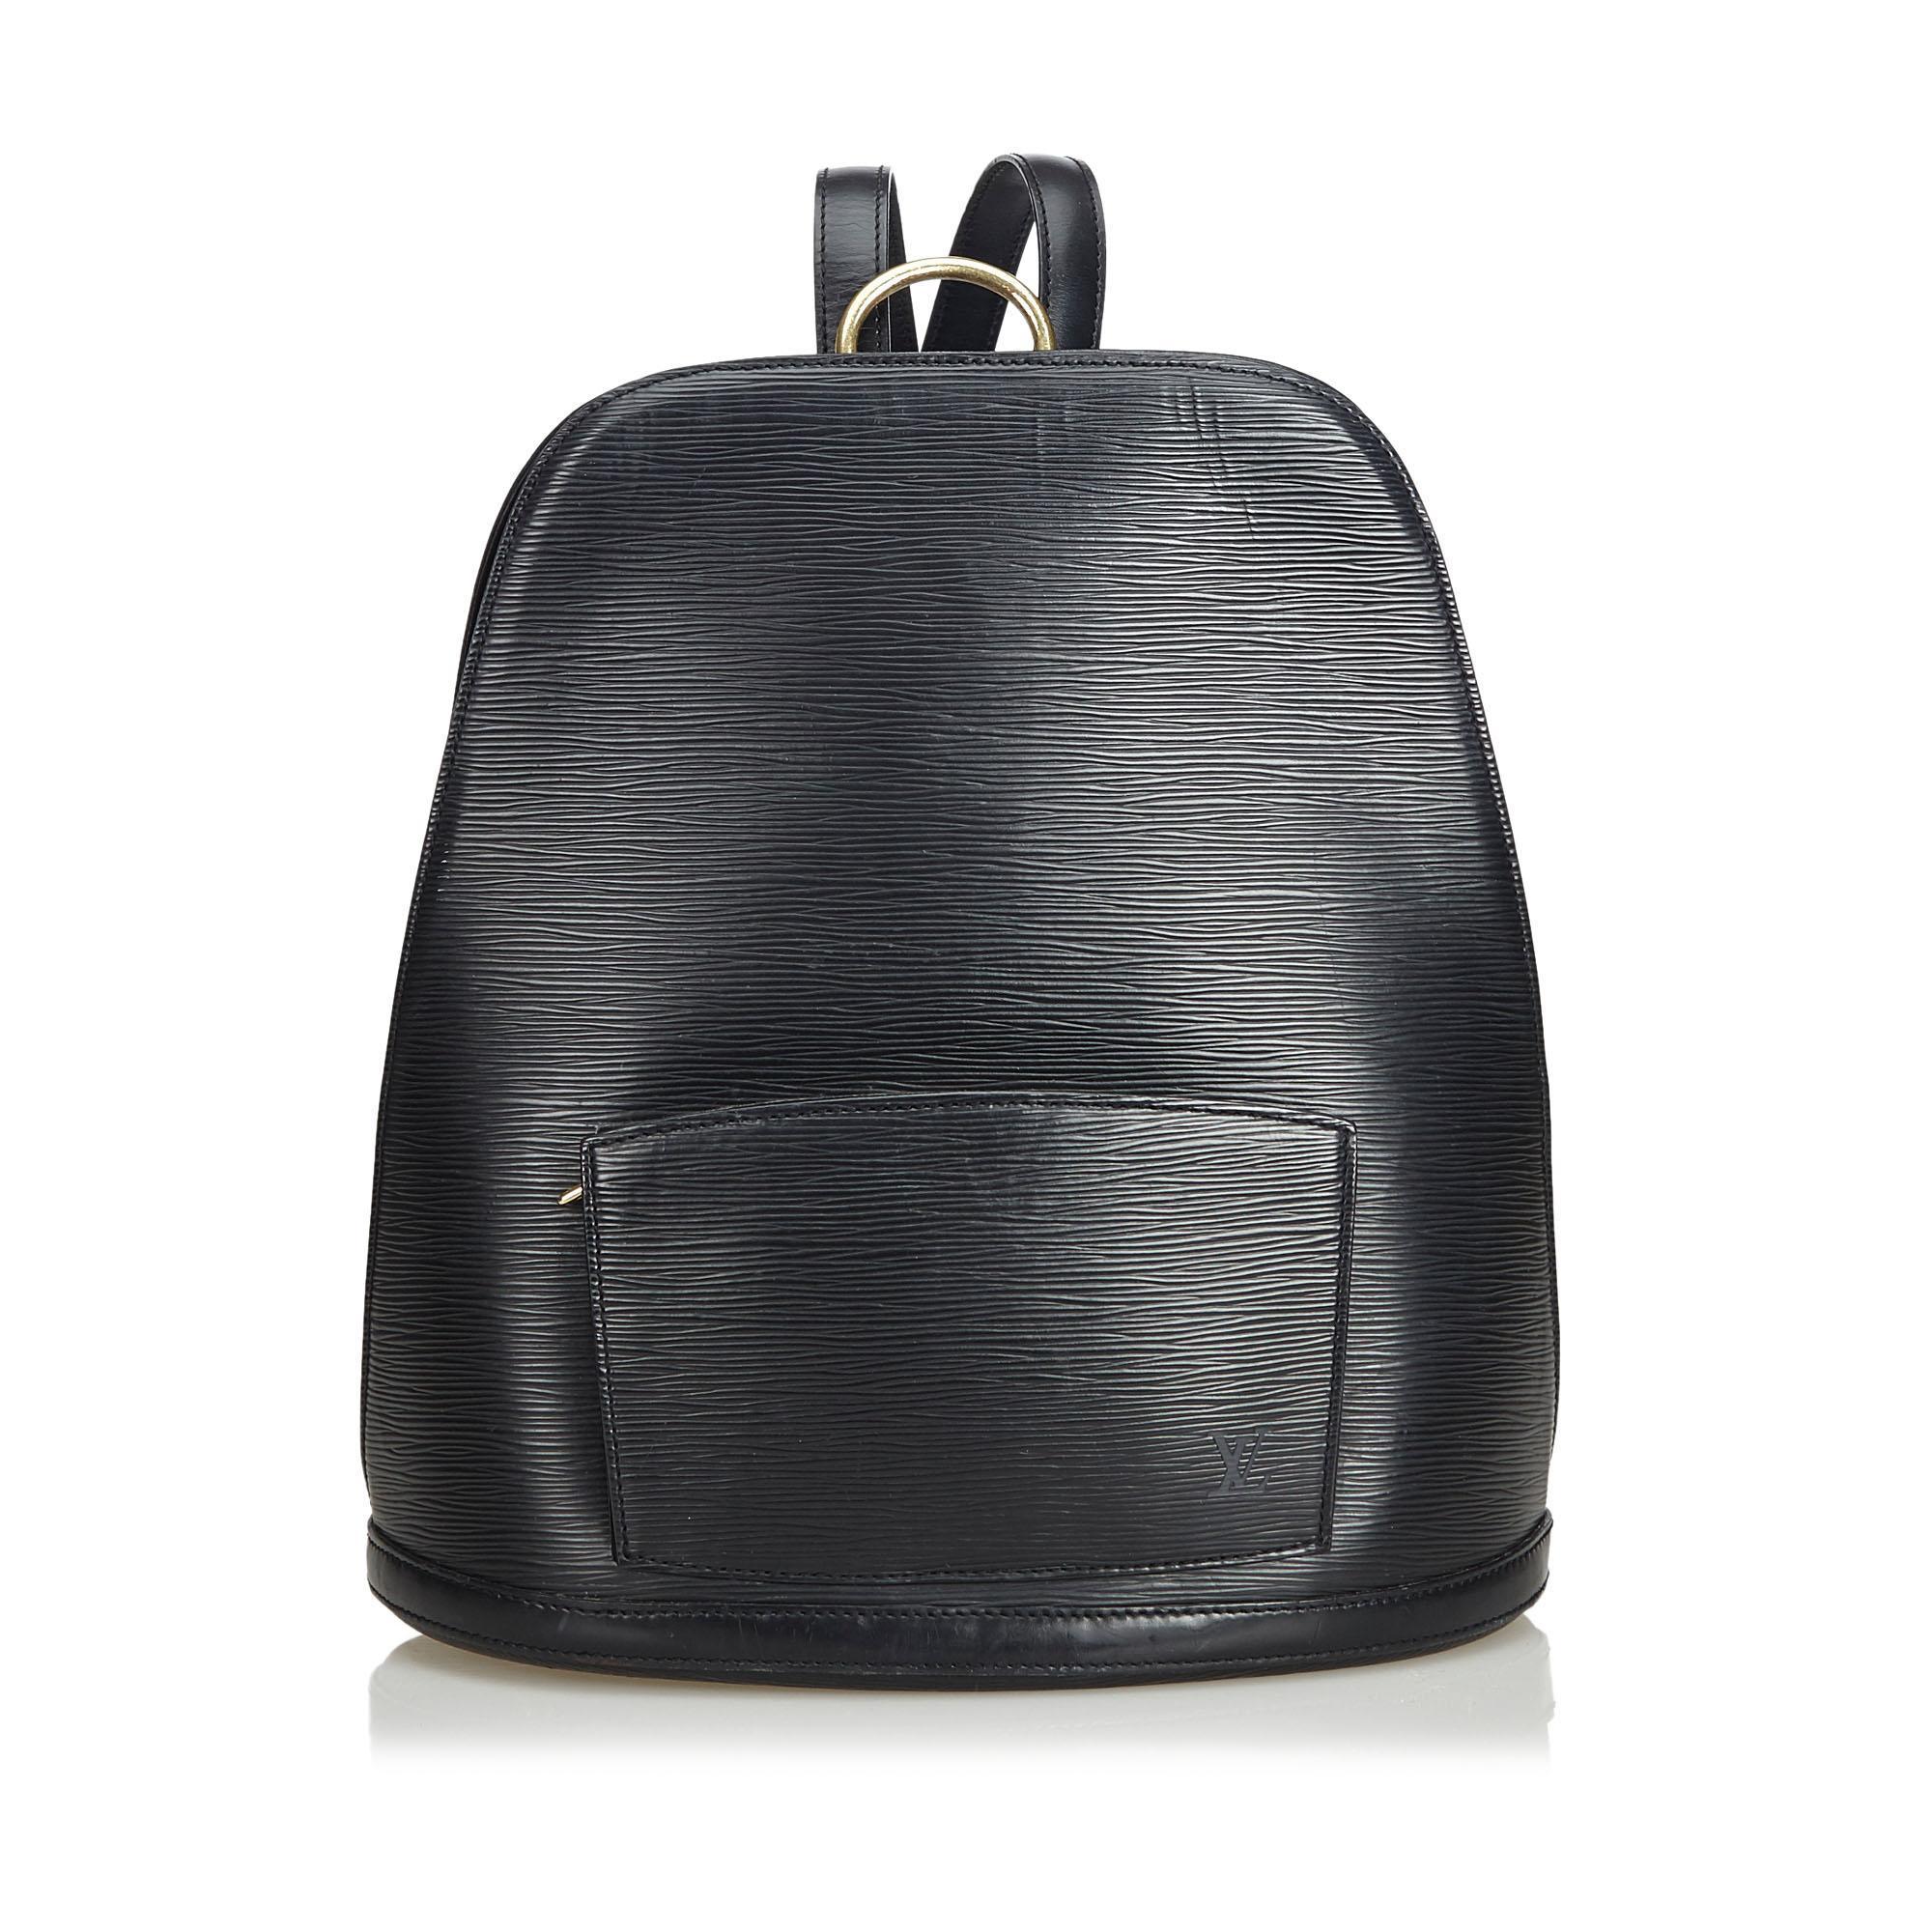 381741fb68fd Lyst - Louis Vuitton Epi Gobelins in Black